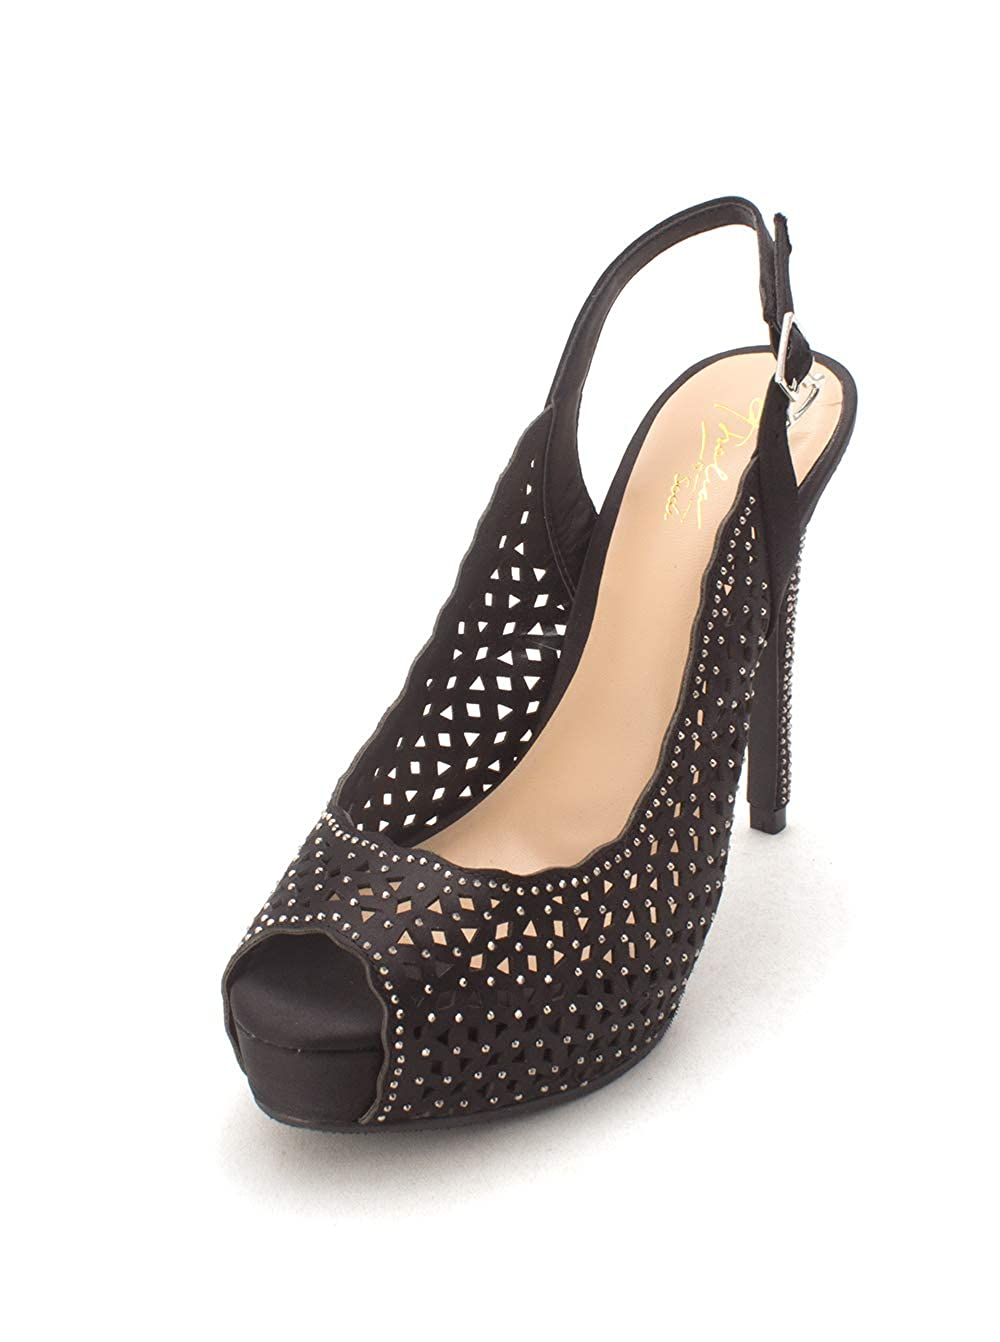 Thalia Sodi Womens Cace Peep Toe Slingback Classic Pumps